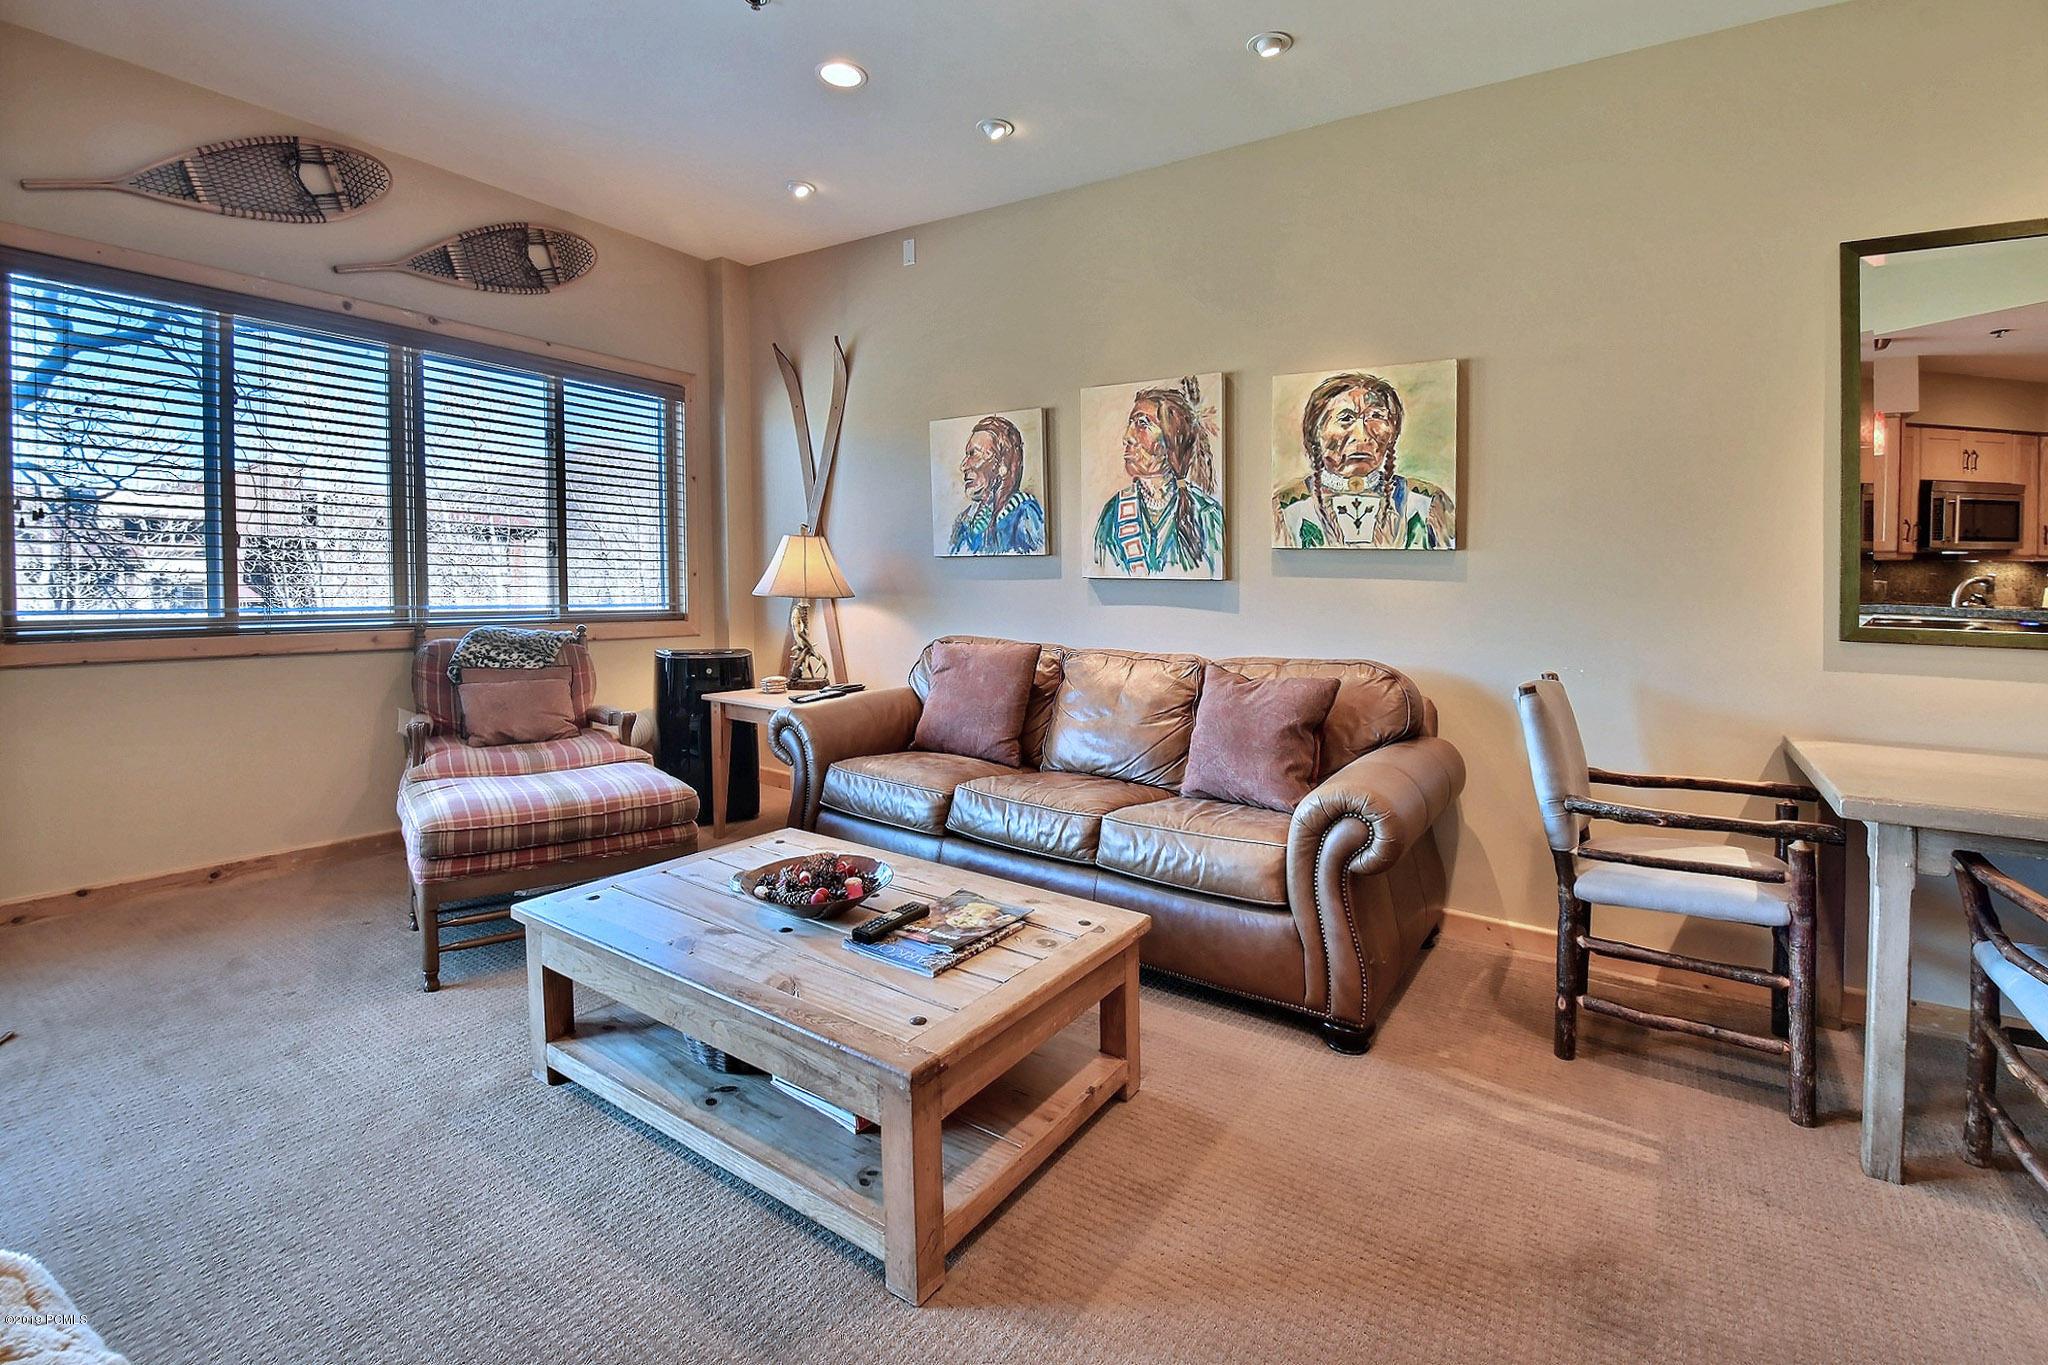 2700 Deer Valley Drive, Park City, Utah 84060, 2 Bedrooms Bedrooms, ,2 BathroomsBathrooms,Condominium,For Sale,Deer Valley,11908448